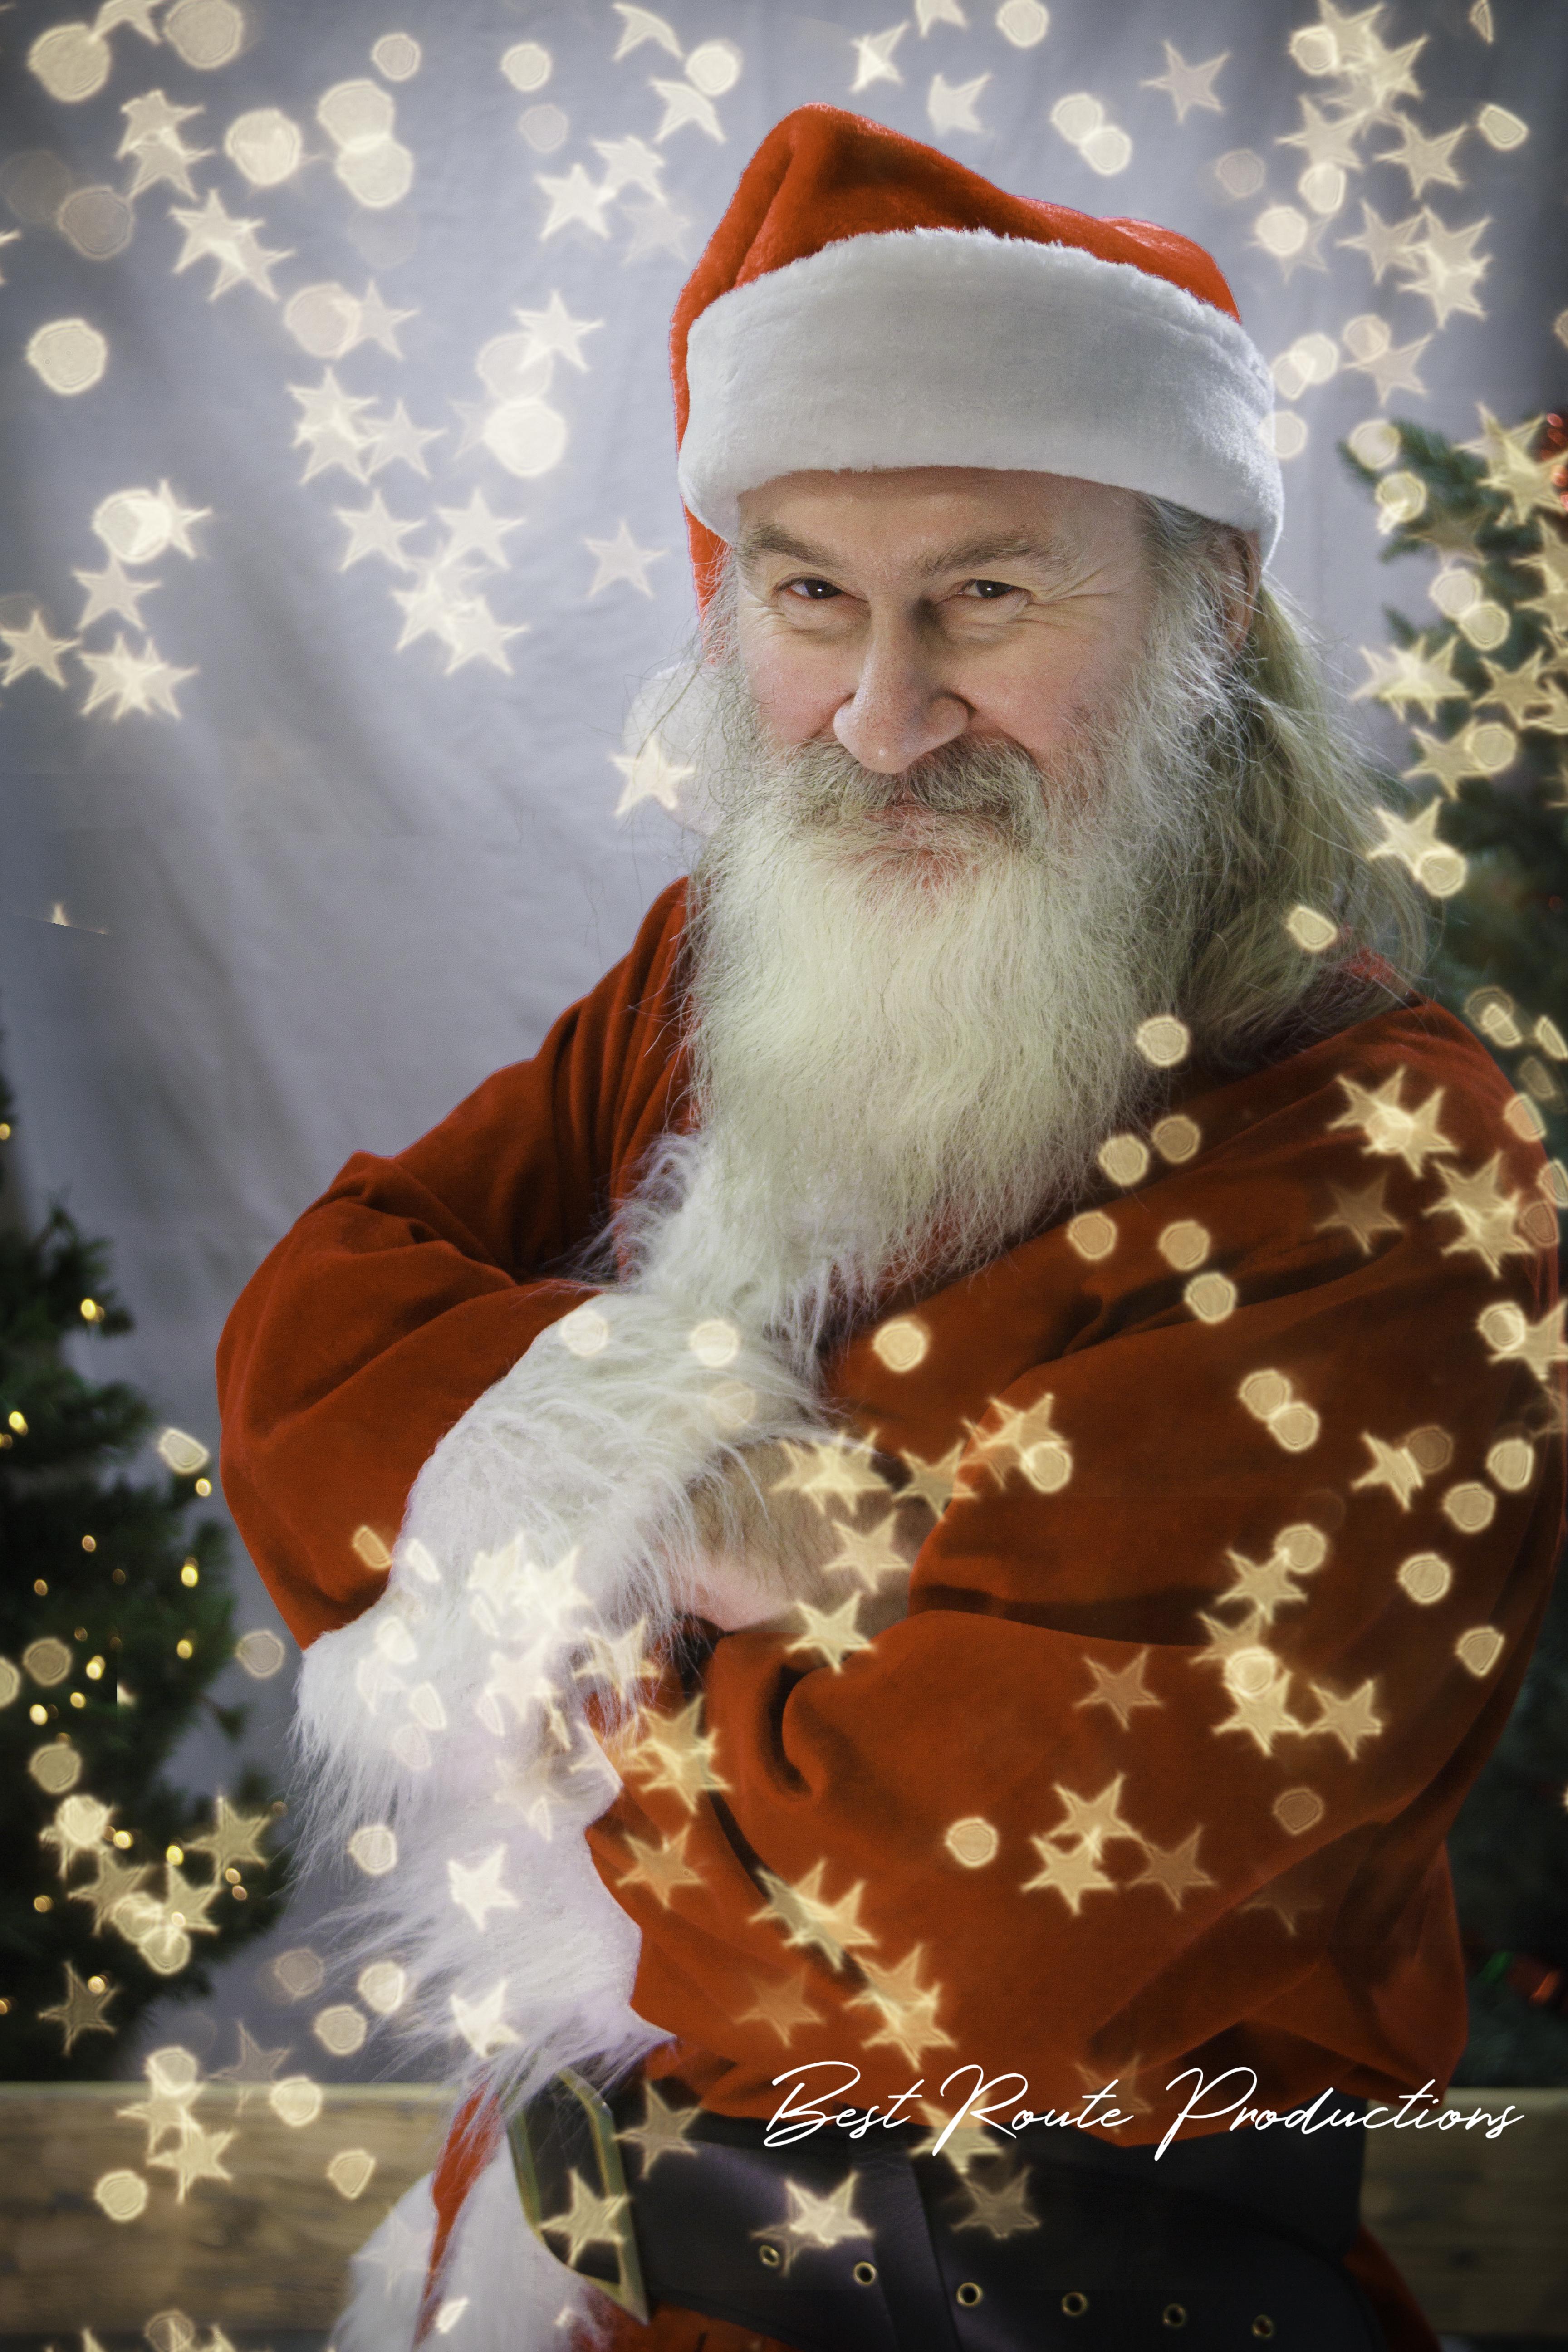 BestRoute_Santa_Web-